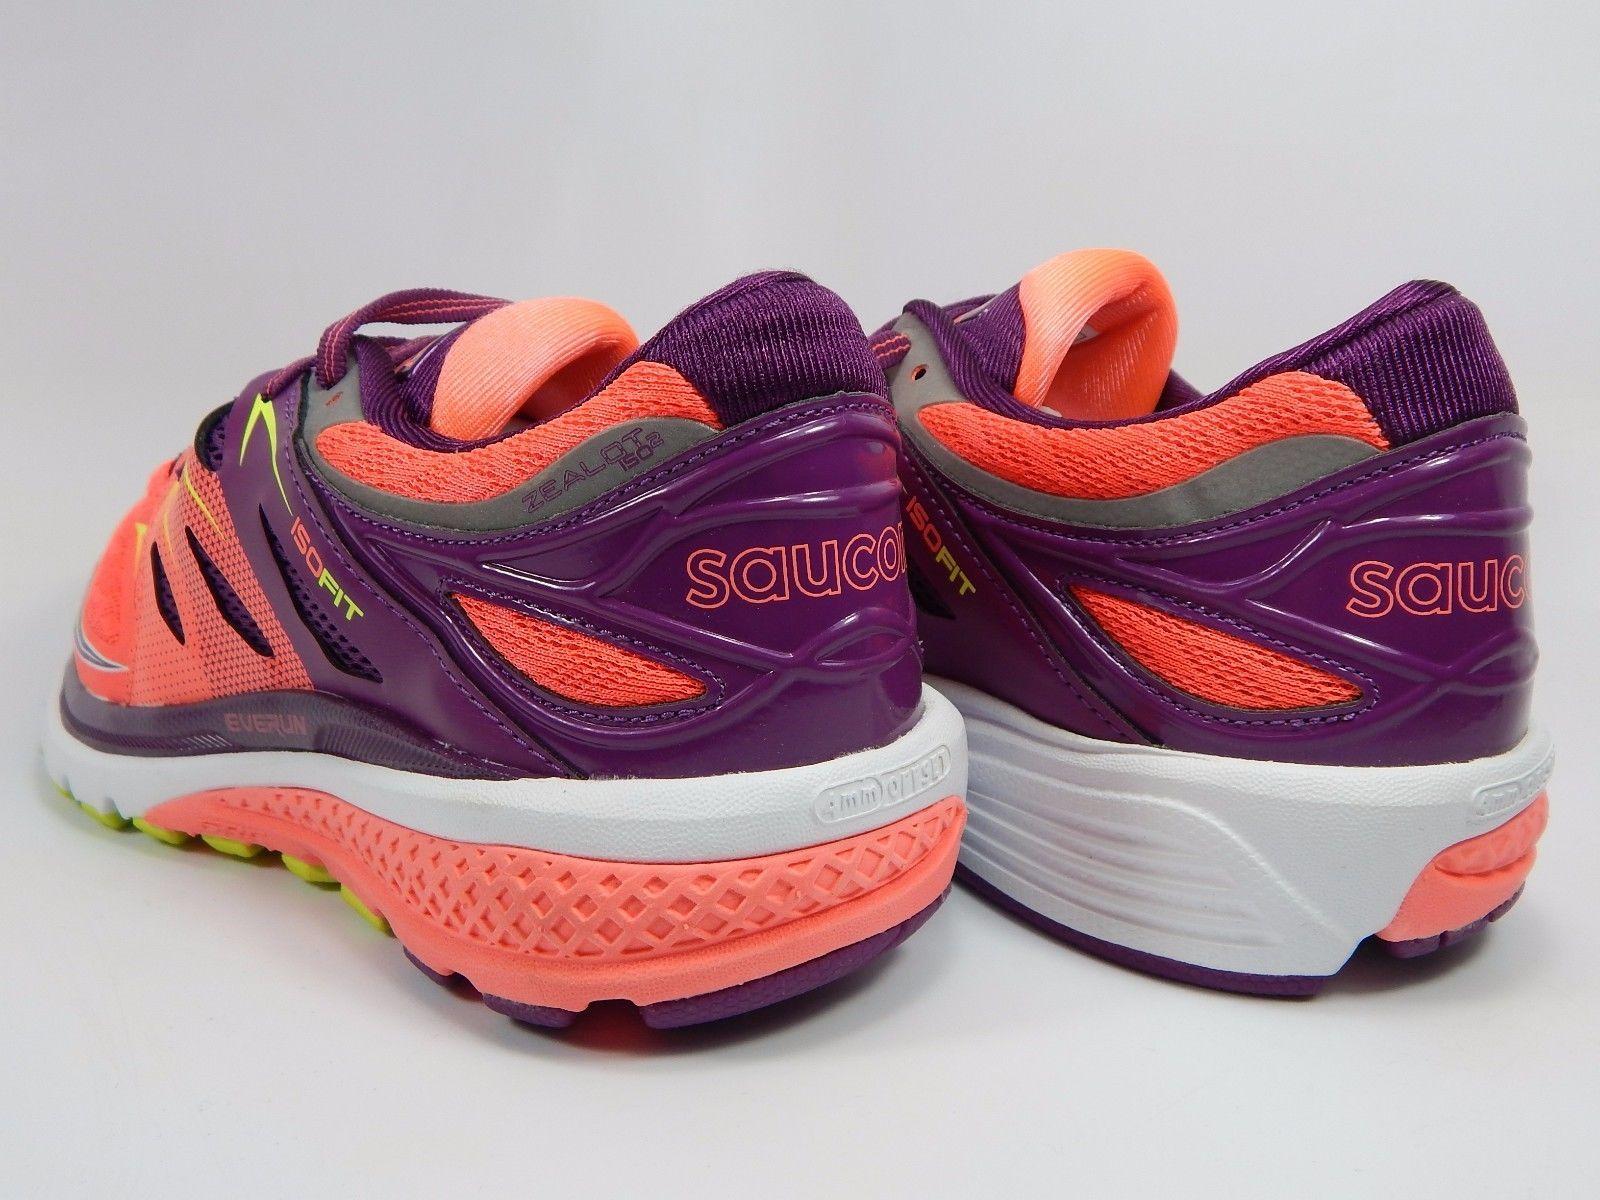 Saucony Zealot ISO 2 Women's Running Shoes Size US 8 M (B) EU 39 Pink S10314-2